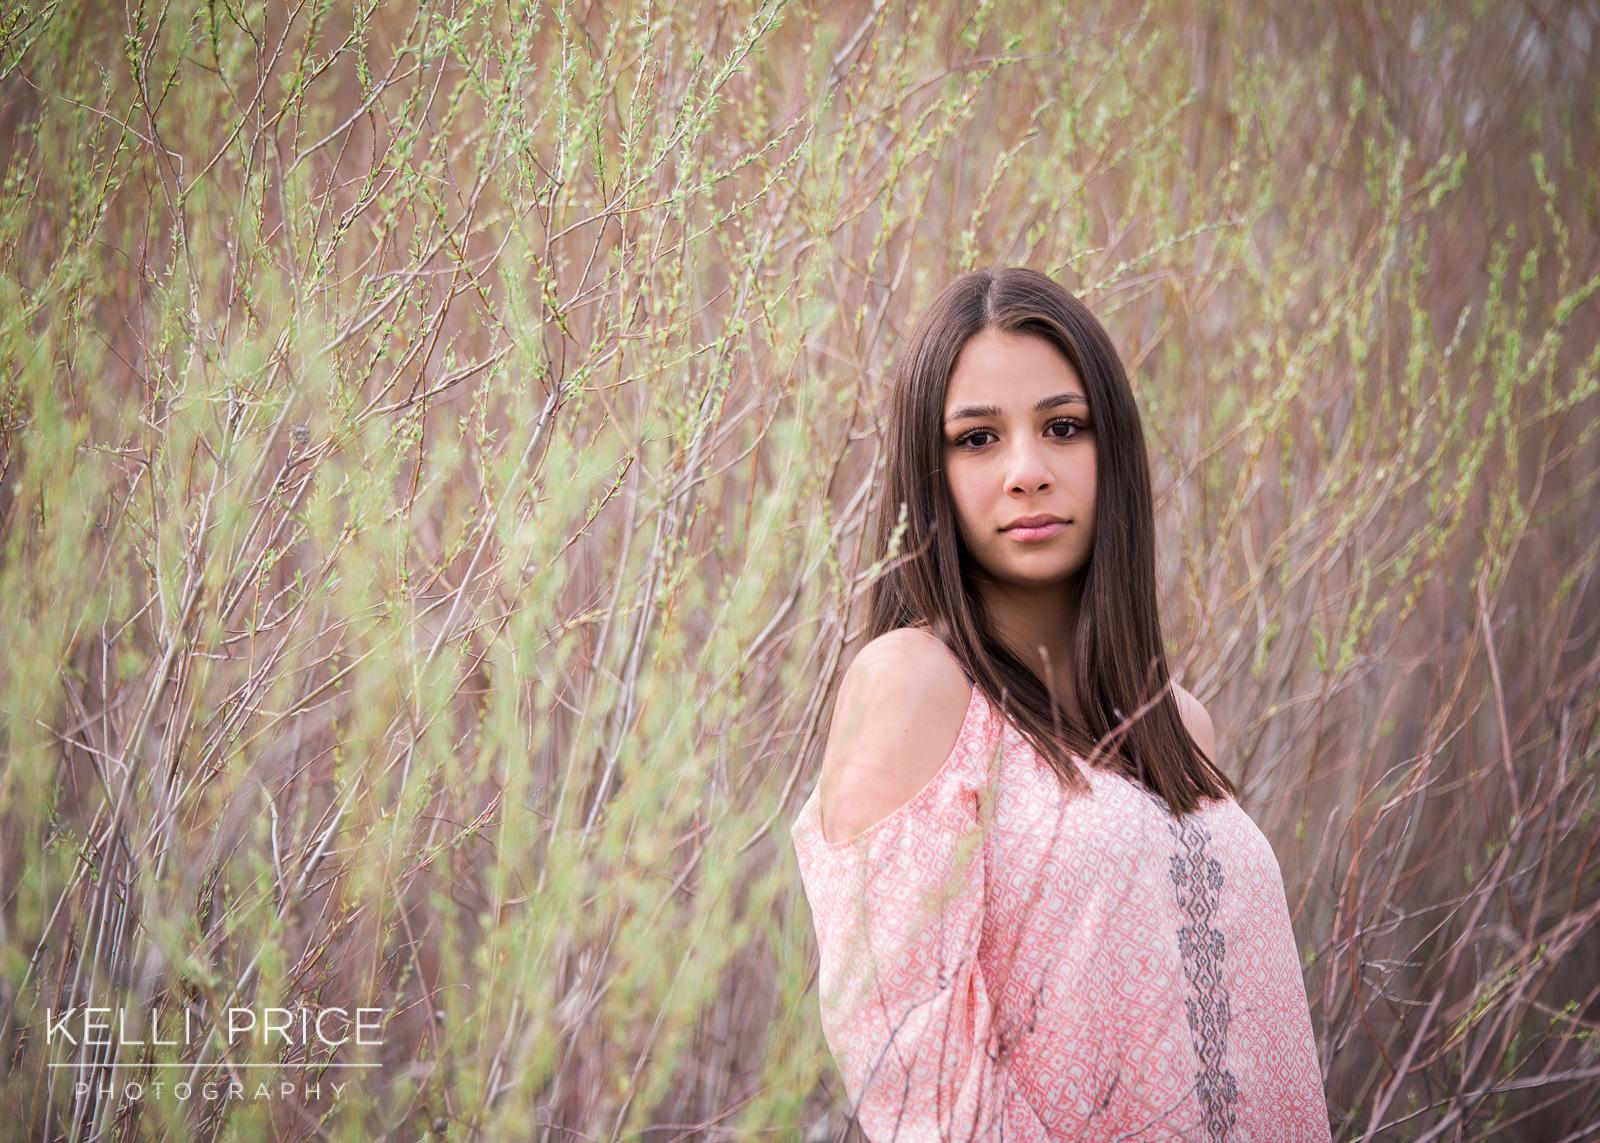 MadisonSeniorPortraits9_KelliPricePhotography_RenoNevadaApril2016.jpg